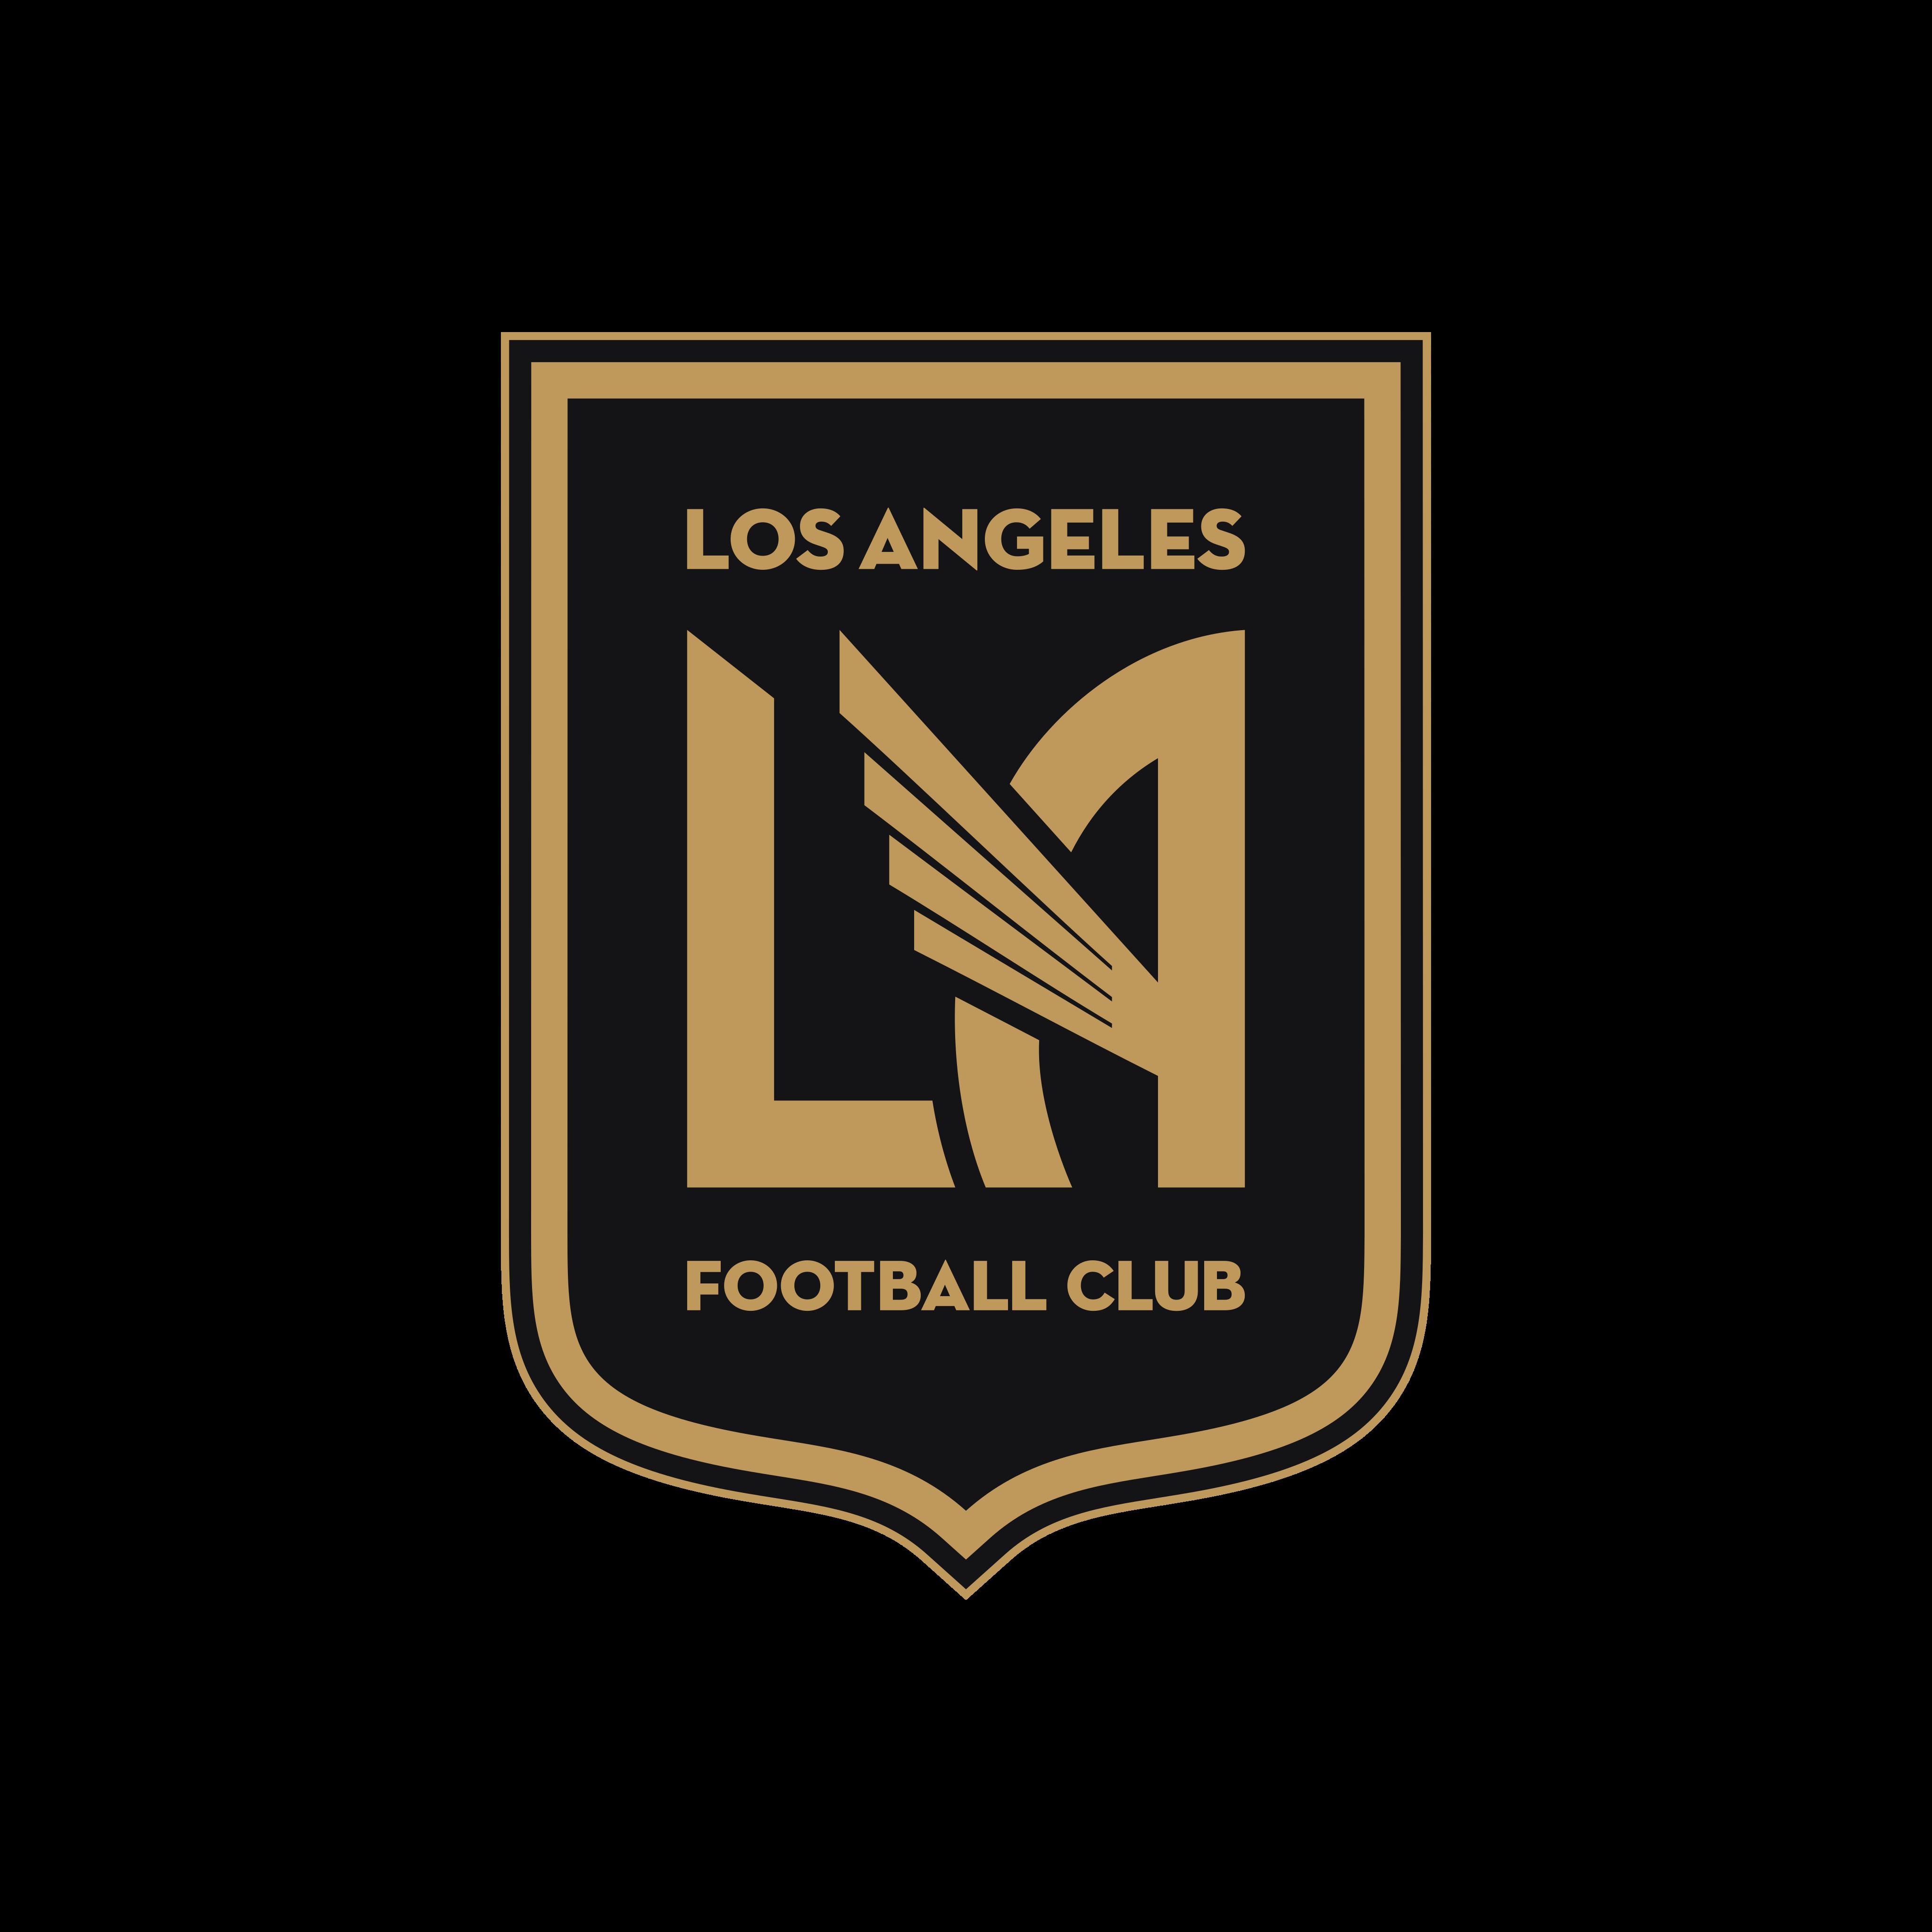 los angeles fc logo 0 - Los Angeles FC Logo